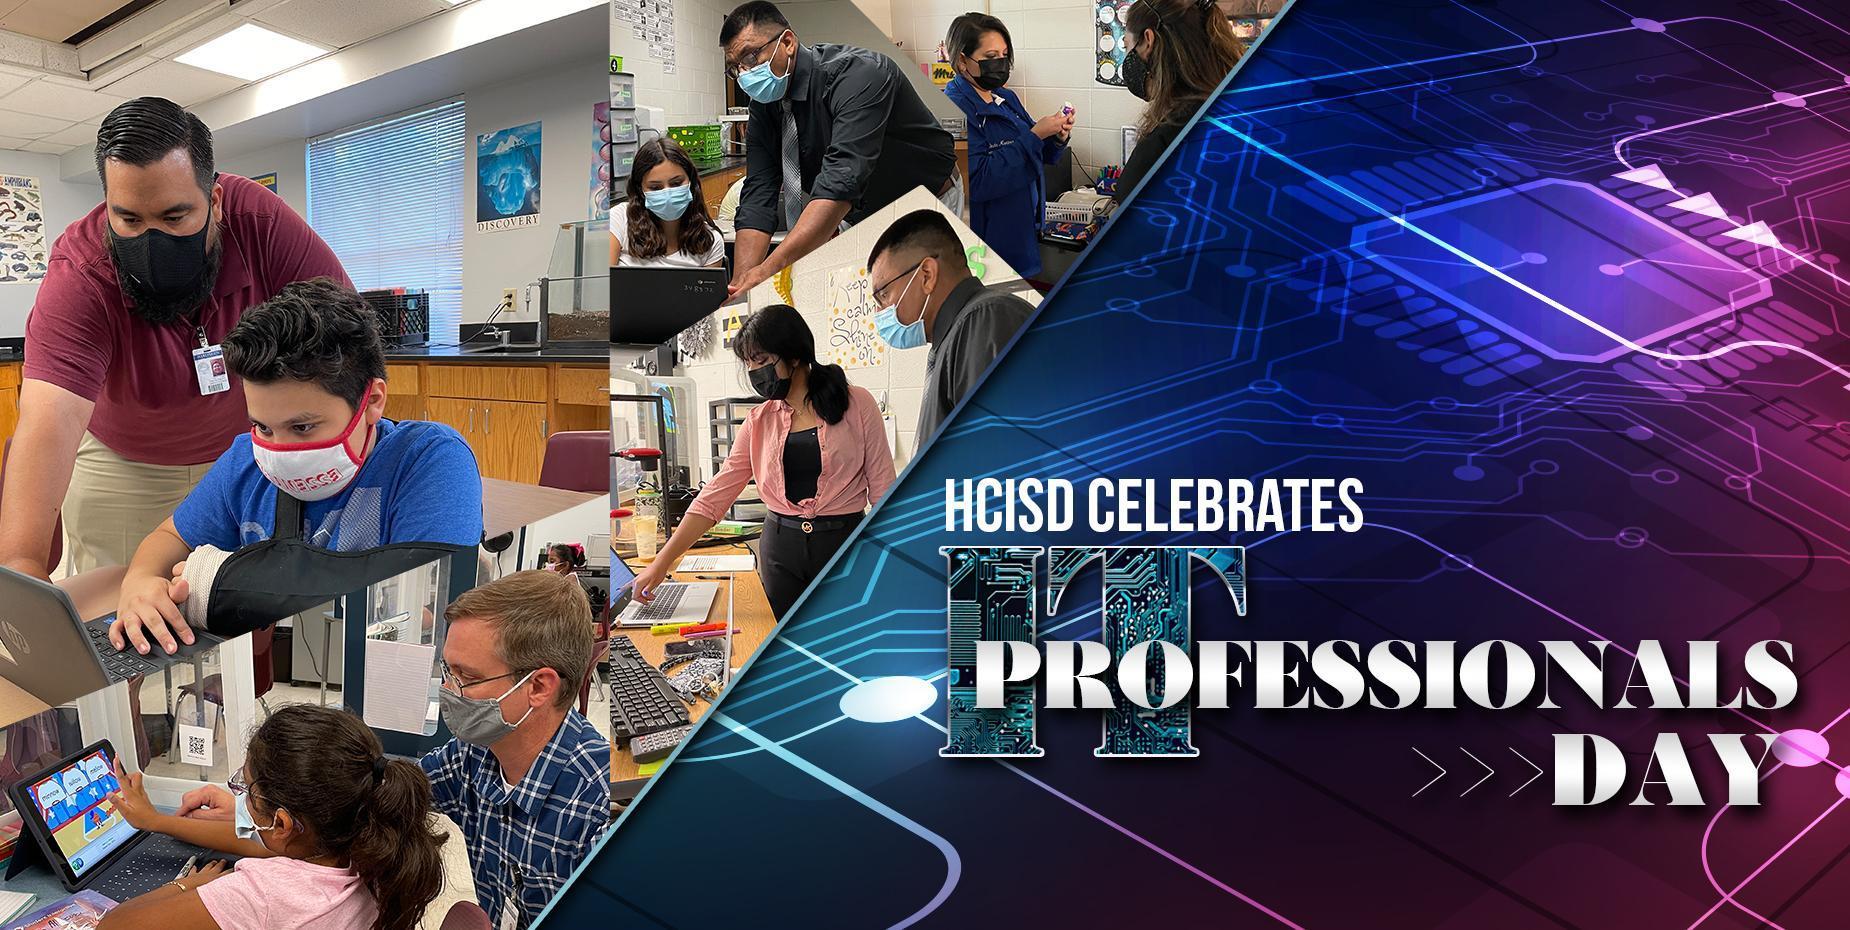 HCISD Celebrates IT Professionals Day